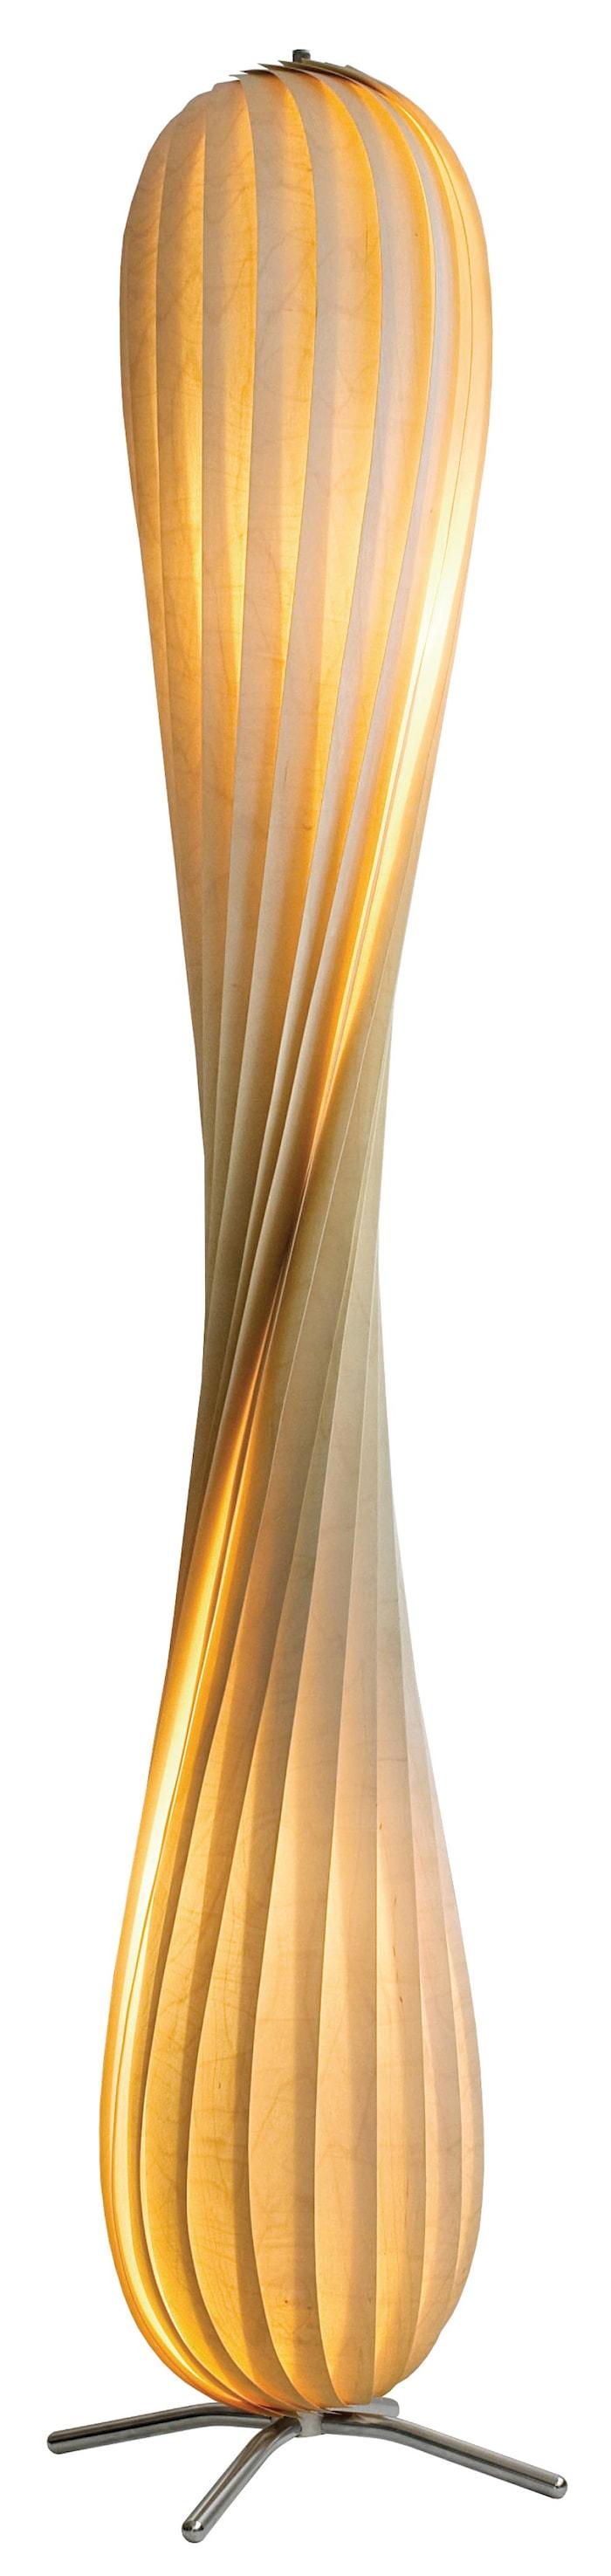 TR7 gulvlampe - Birk